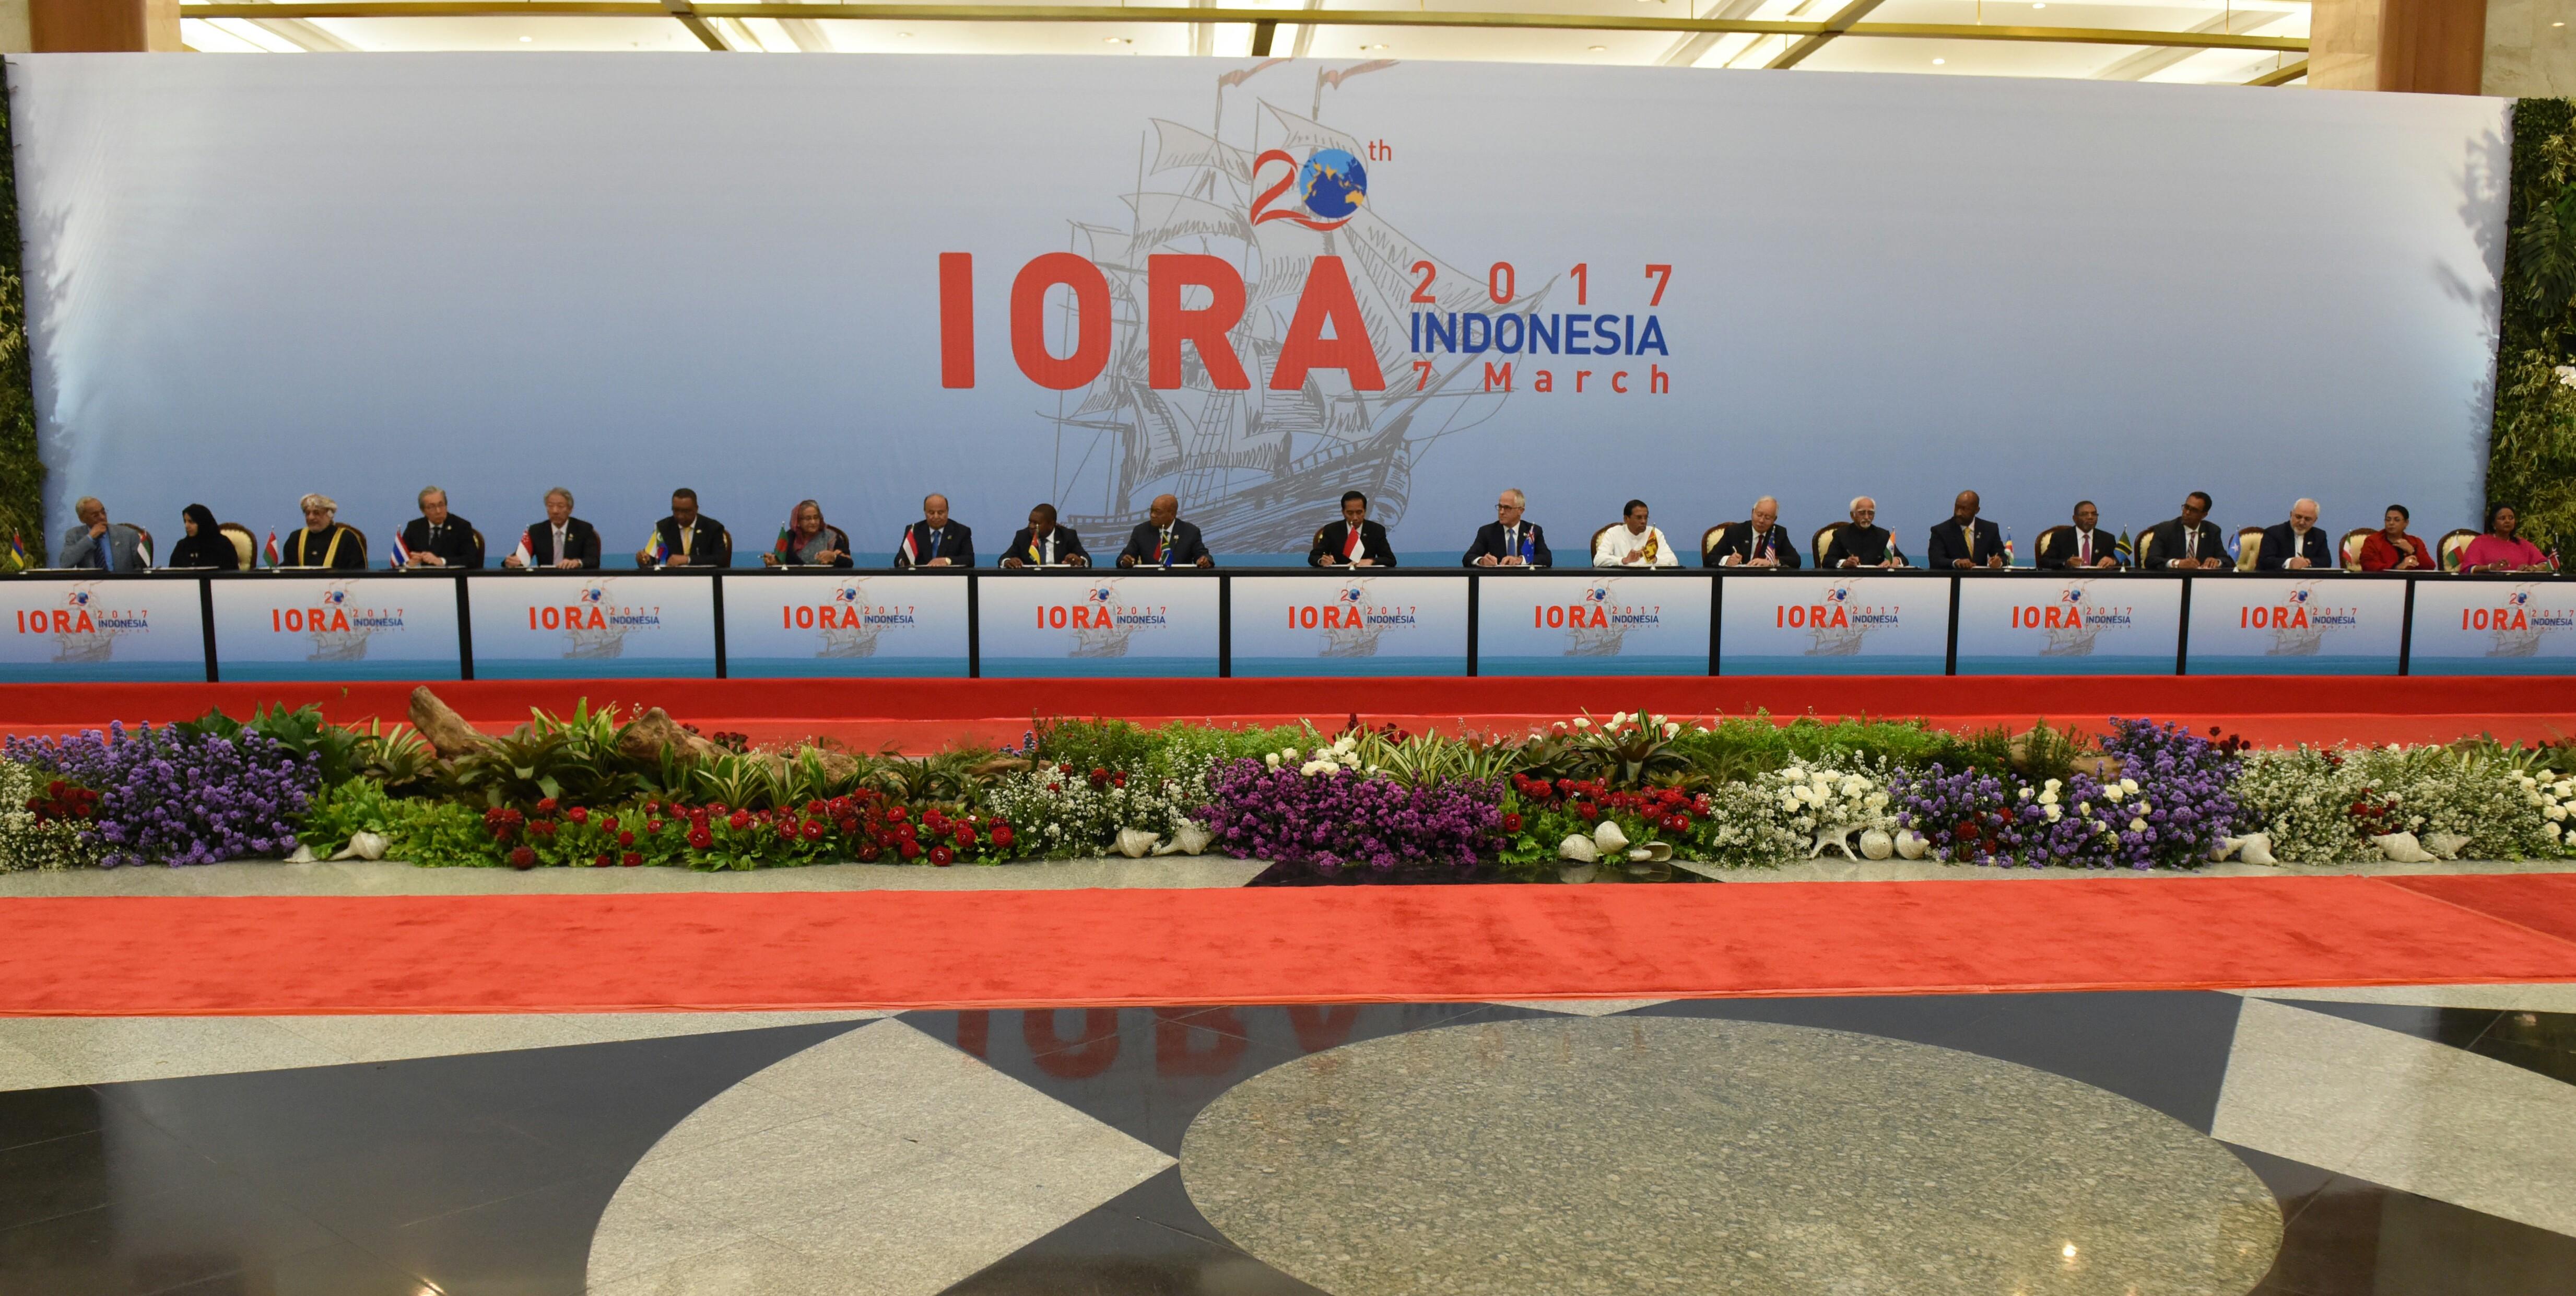 Presiden Jokowi bersama pimpinan delegasi negara peserta KTT IORA menandatangan dokumen Jakarta Concord, di JCC Jakarta, Selasa (6/3) siang. (Foto: Rahmat/Humas)